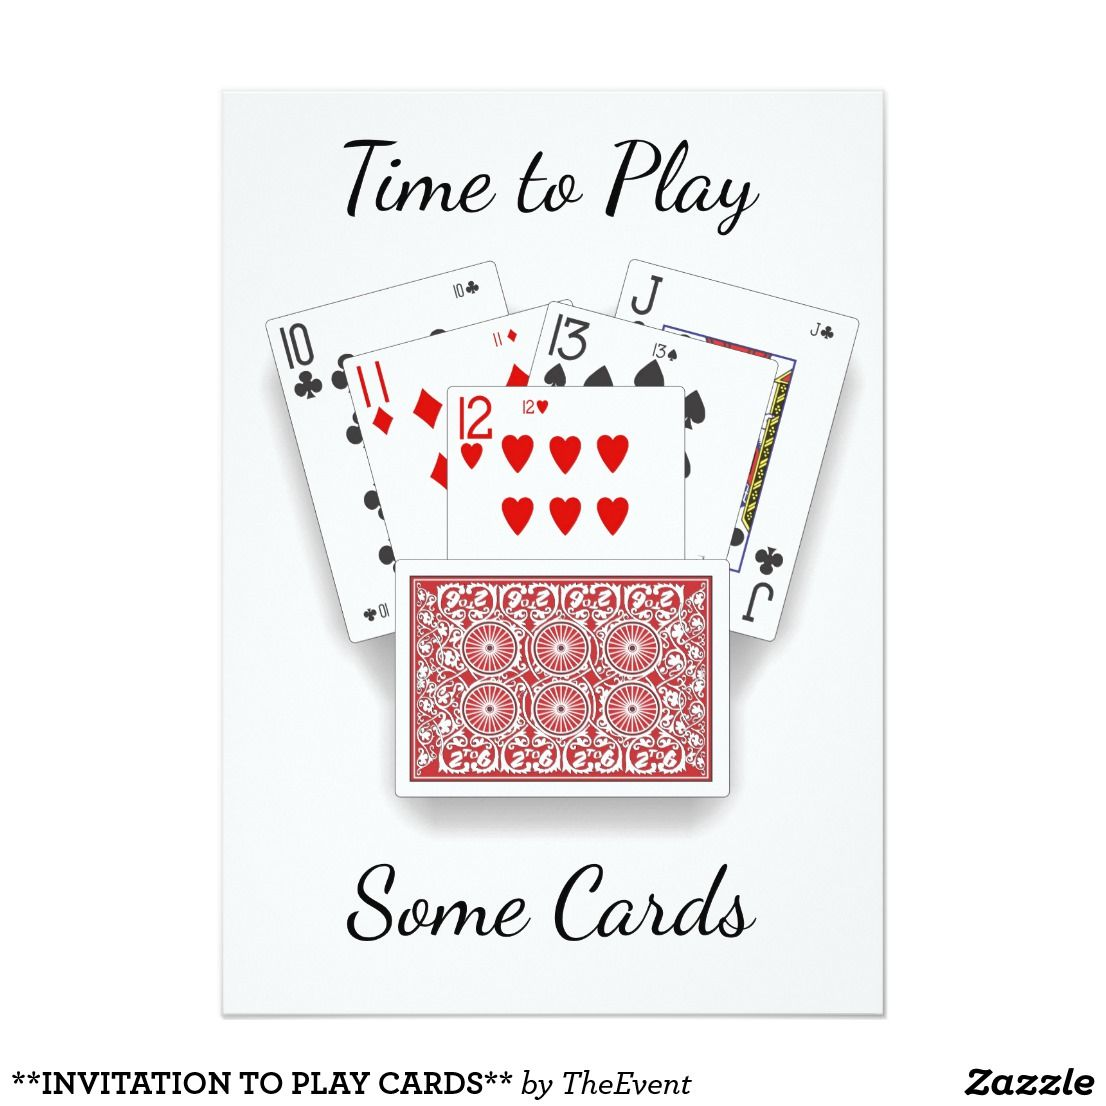 Invitation To Play Cards Invitation Zazzle Com Invitation To Play Playing Card Invitation Family Games To Play